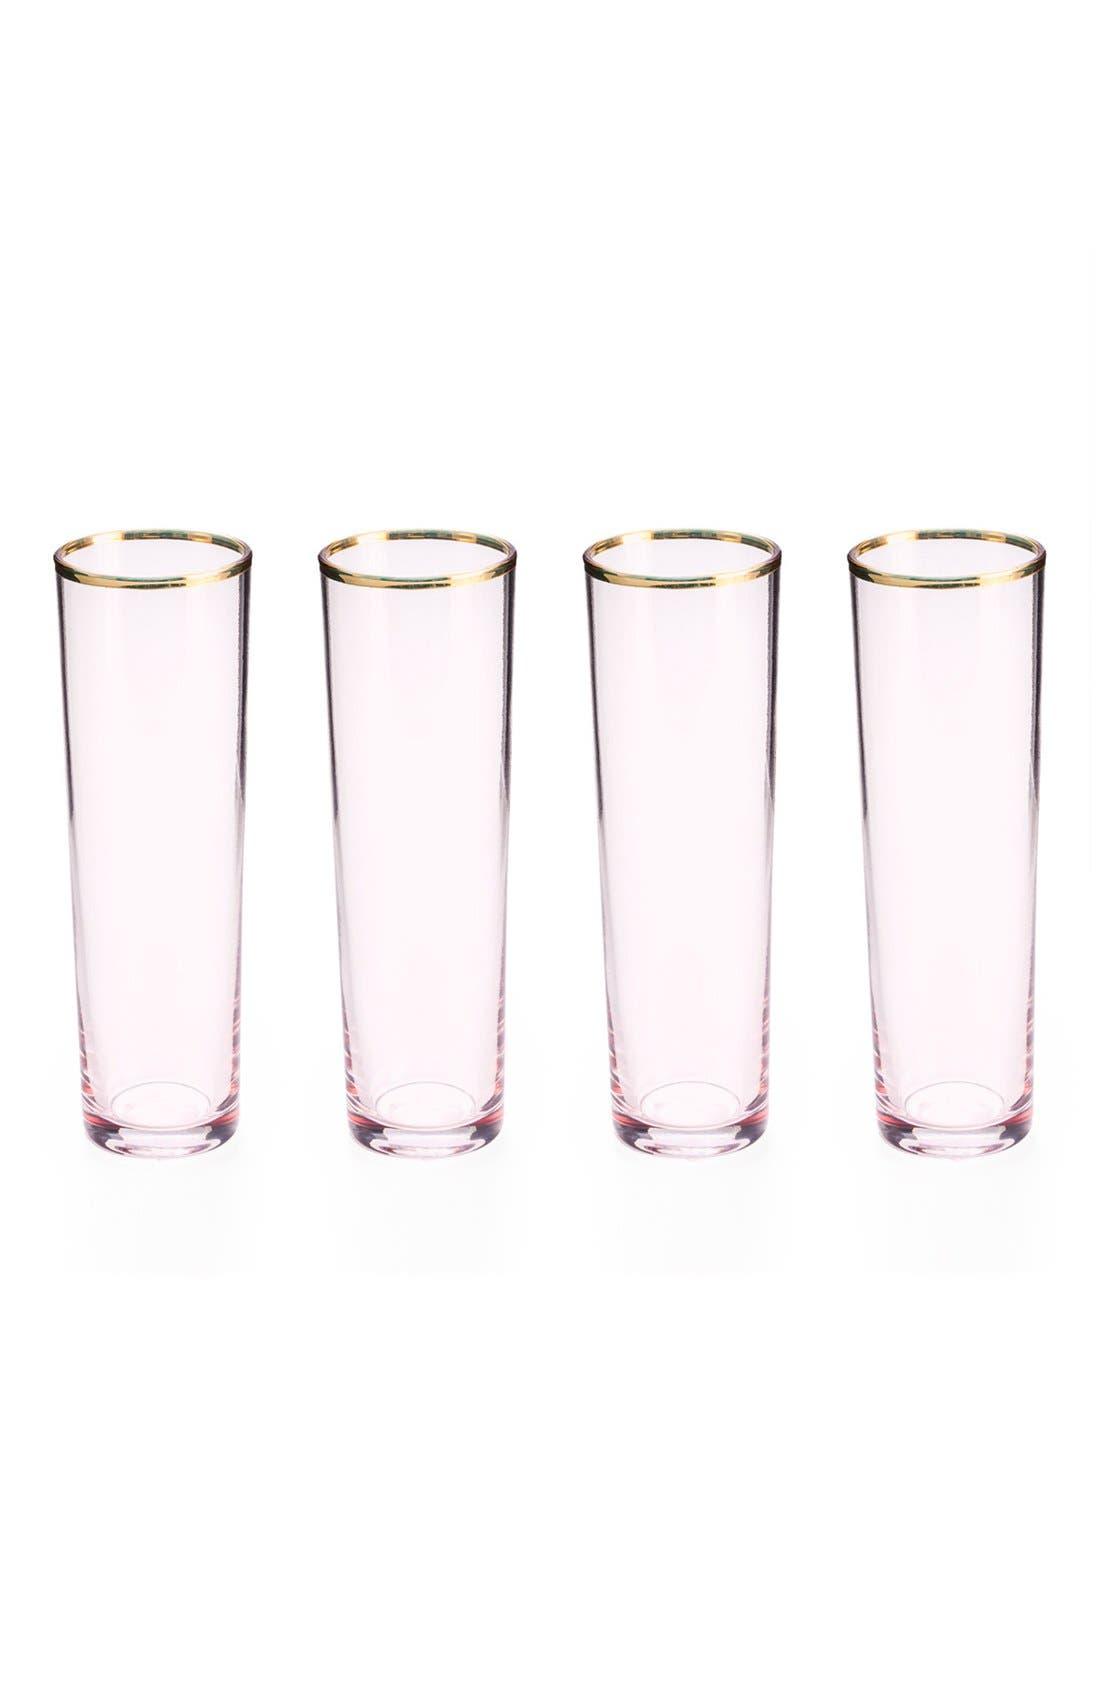 Main Image - Rosanna Pink Glass Champagne Flutes (Set of 4)